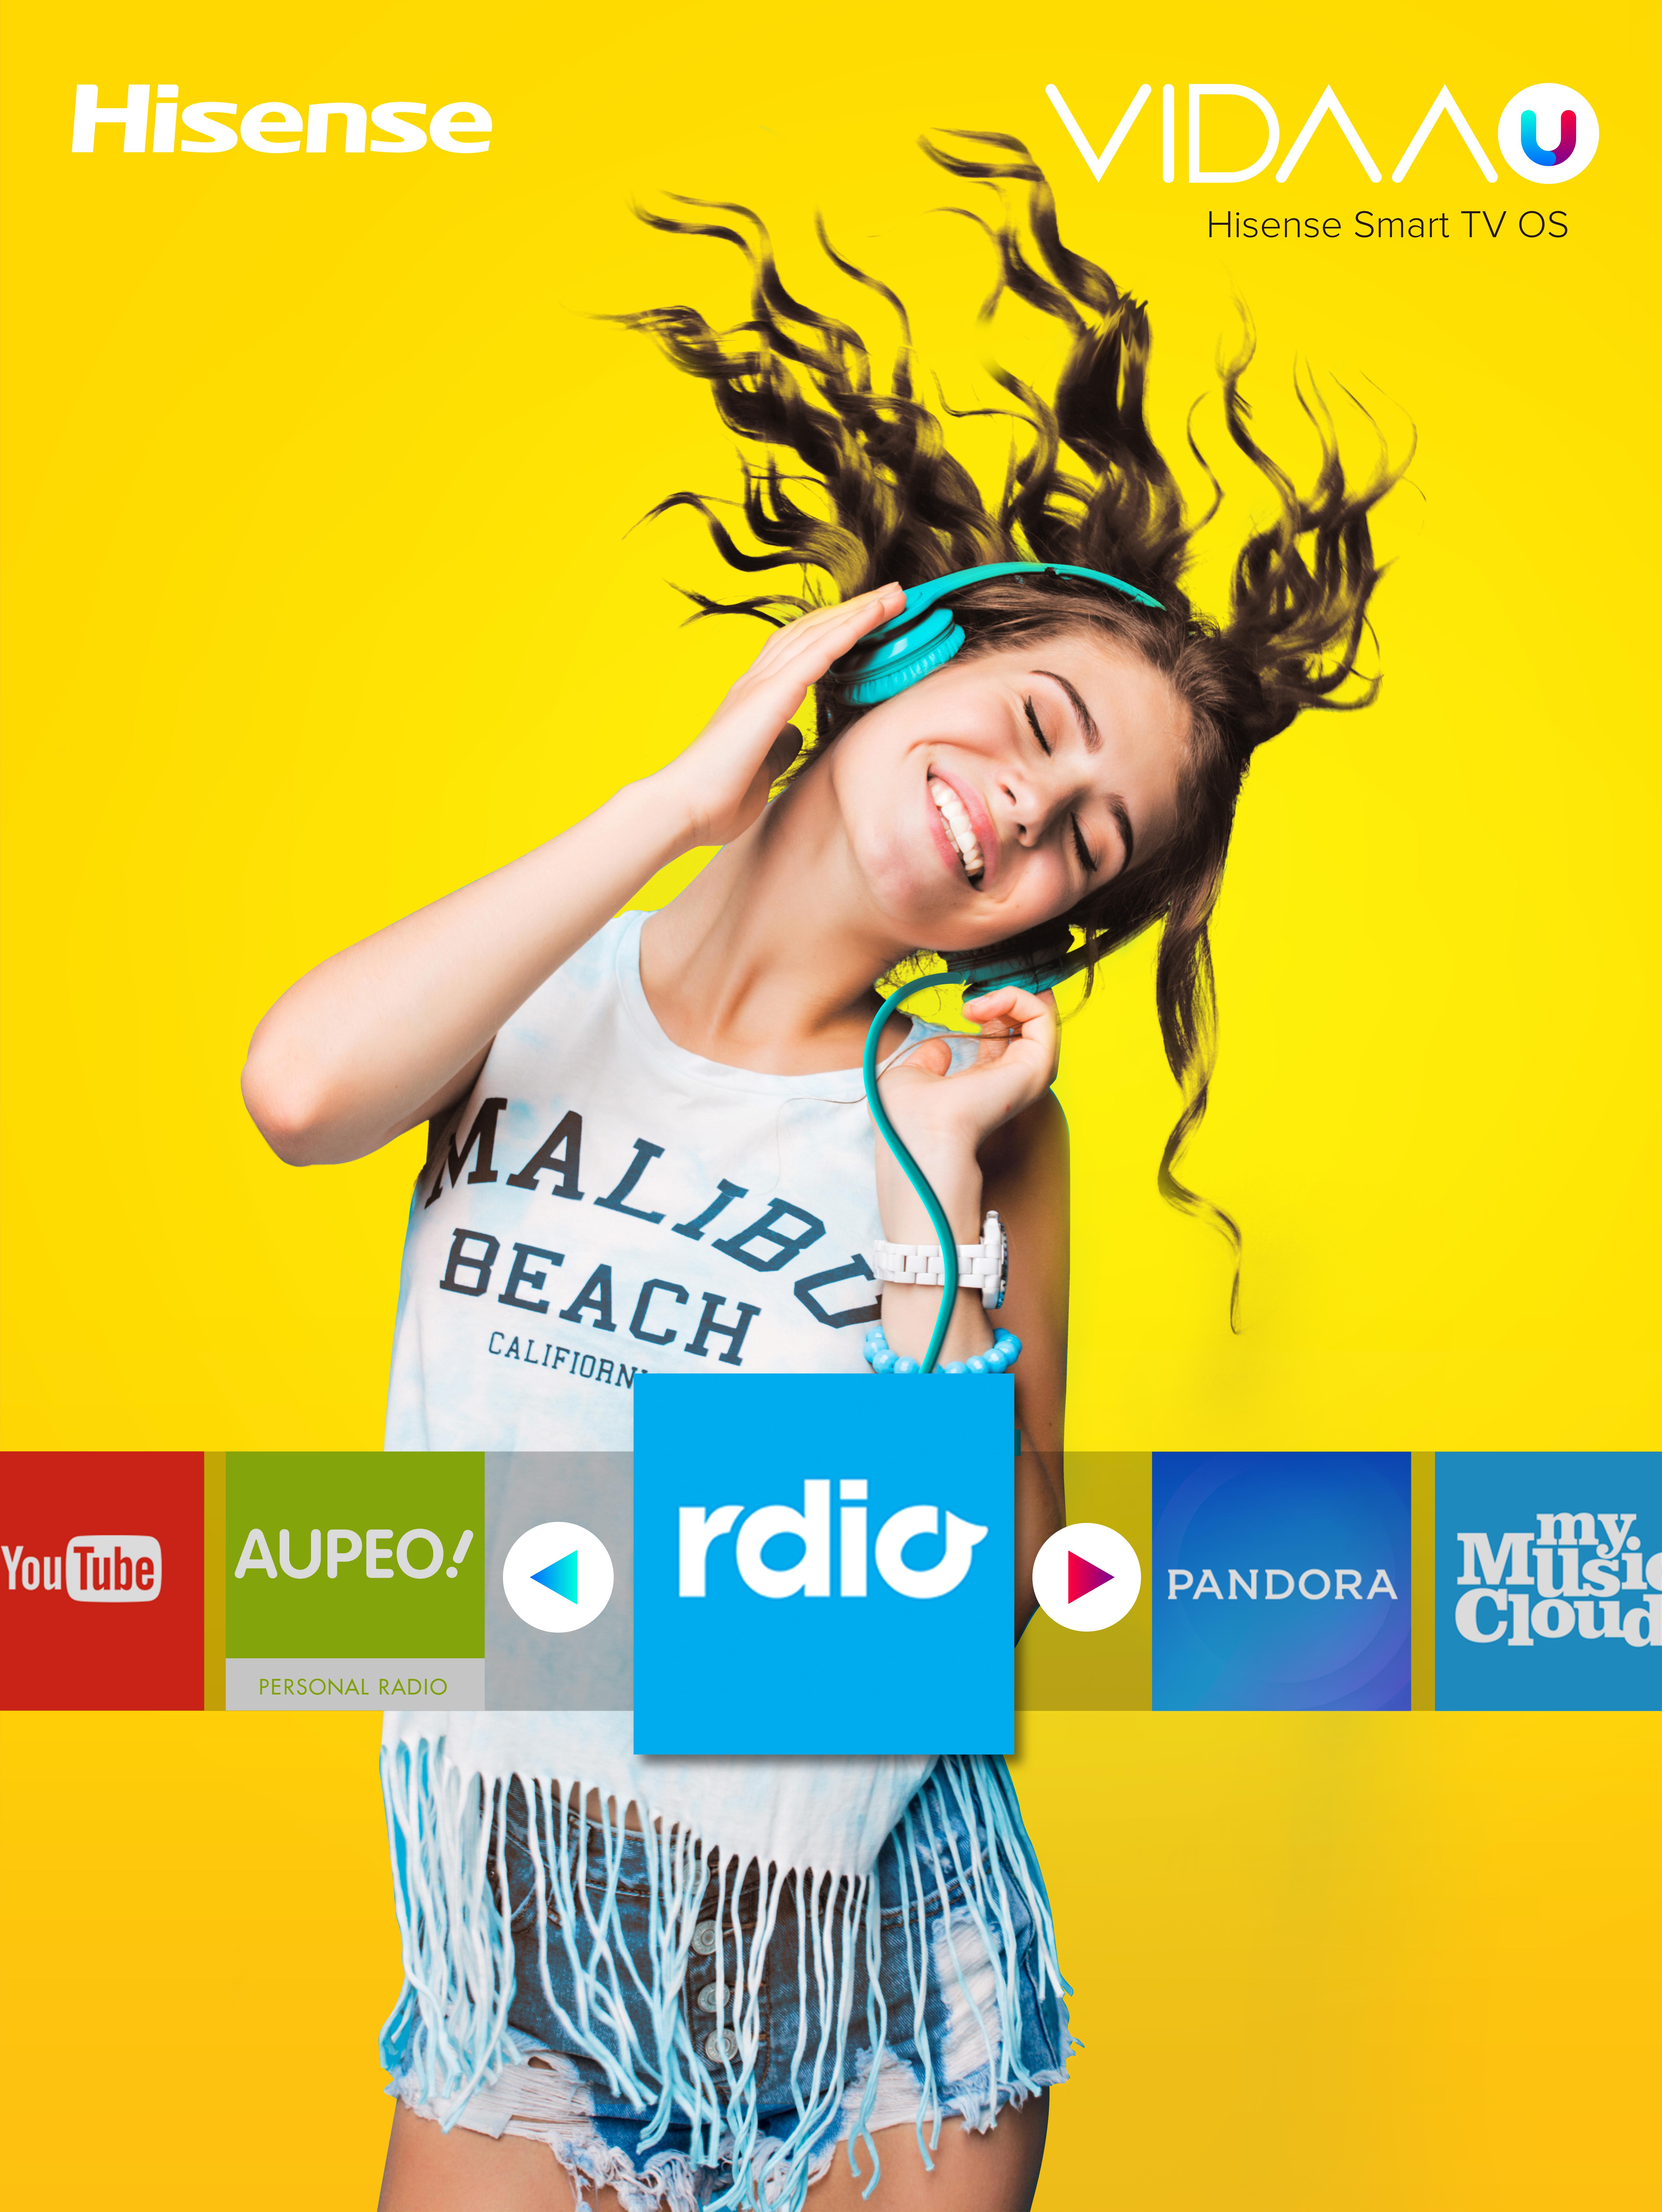 hisense smart tv music